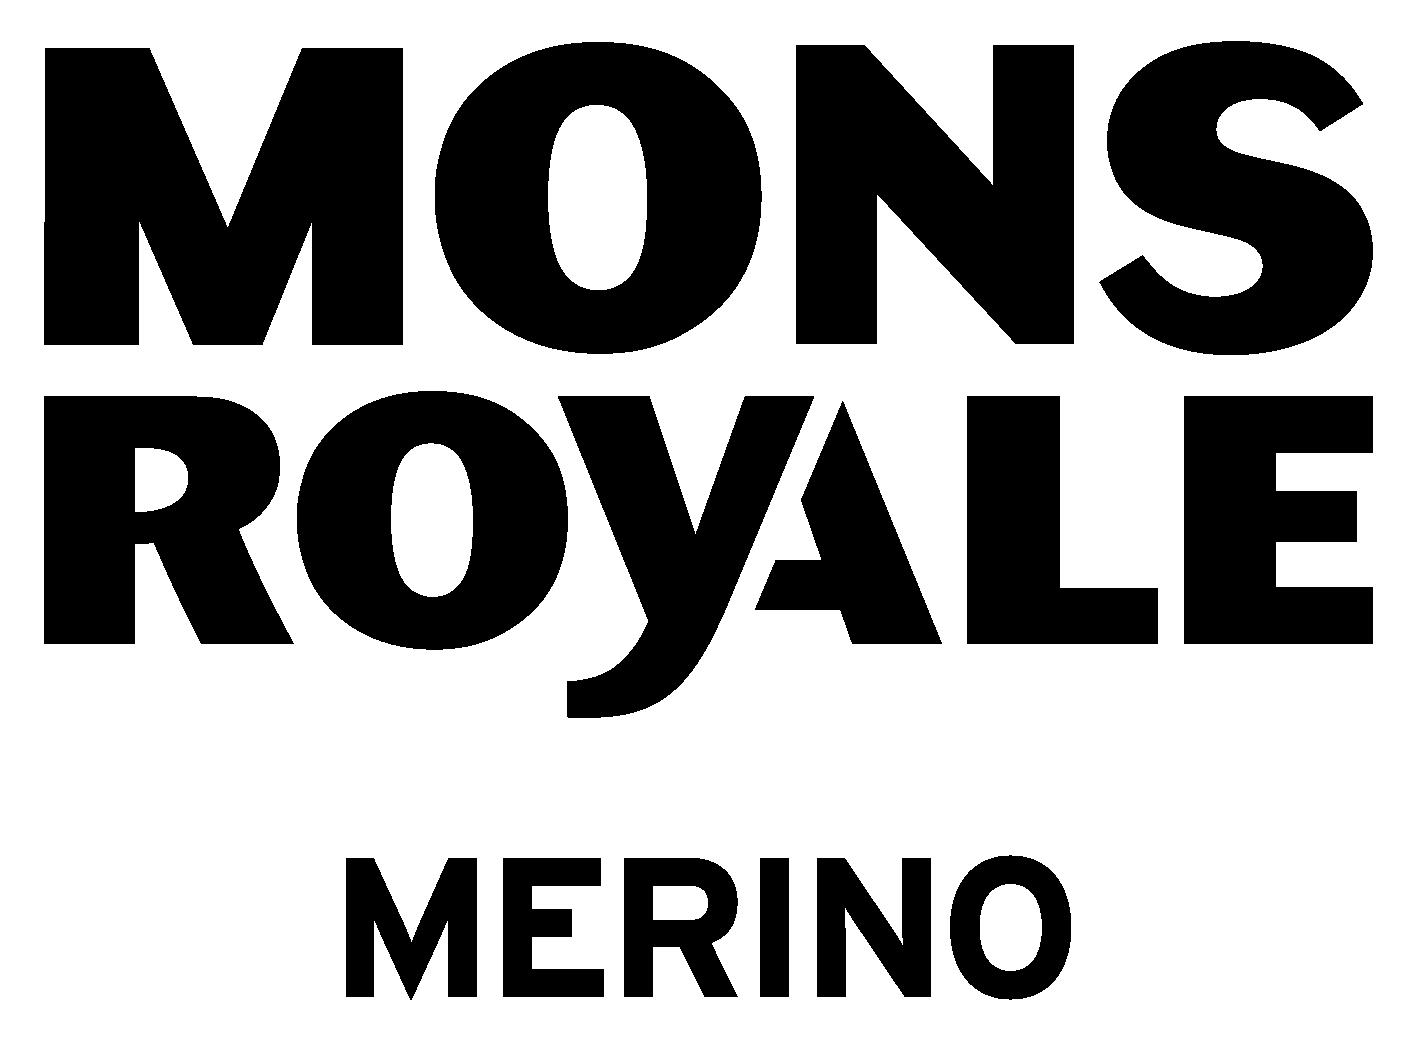 Mons Royale, Logo/Brand | matadorworld.innsbruck